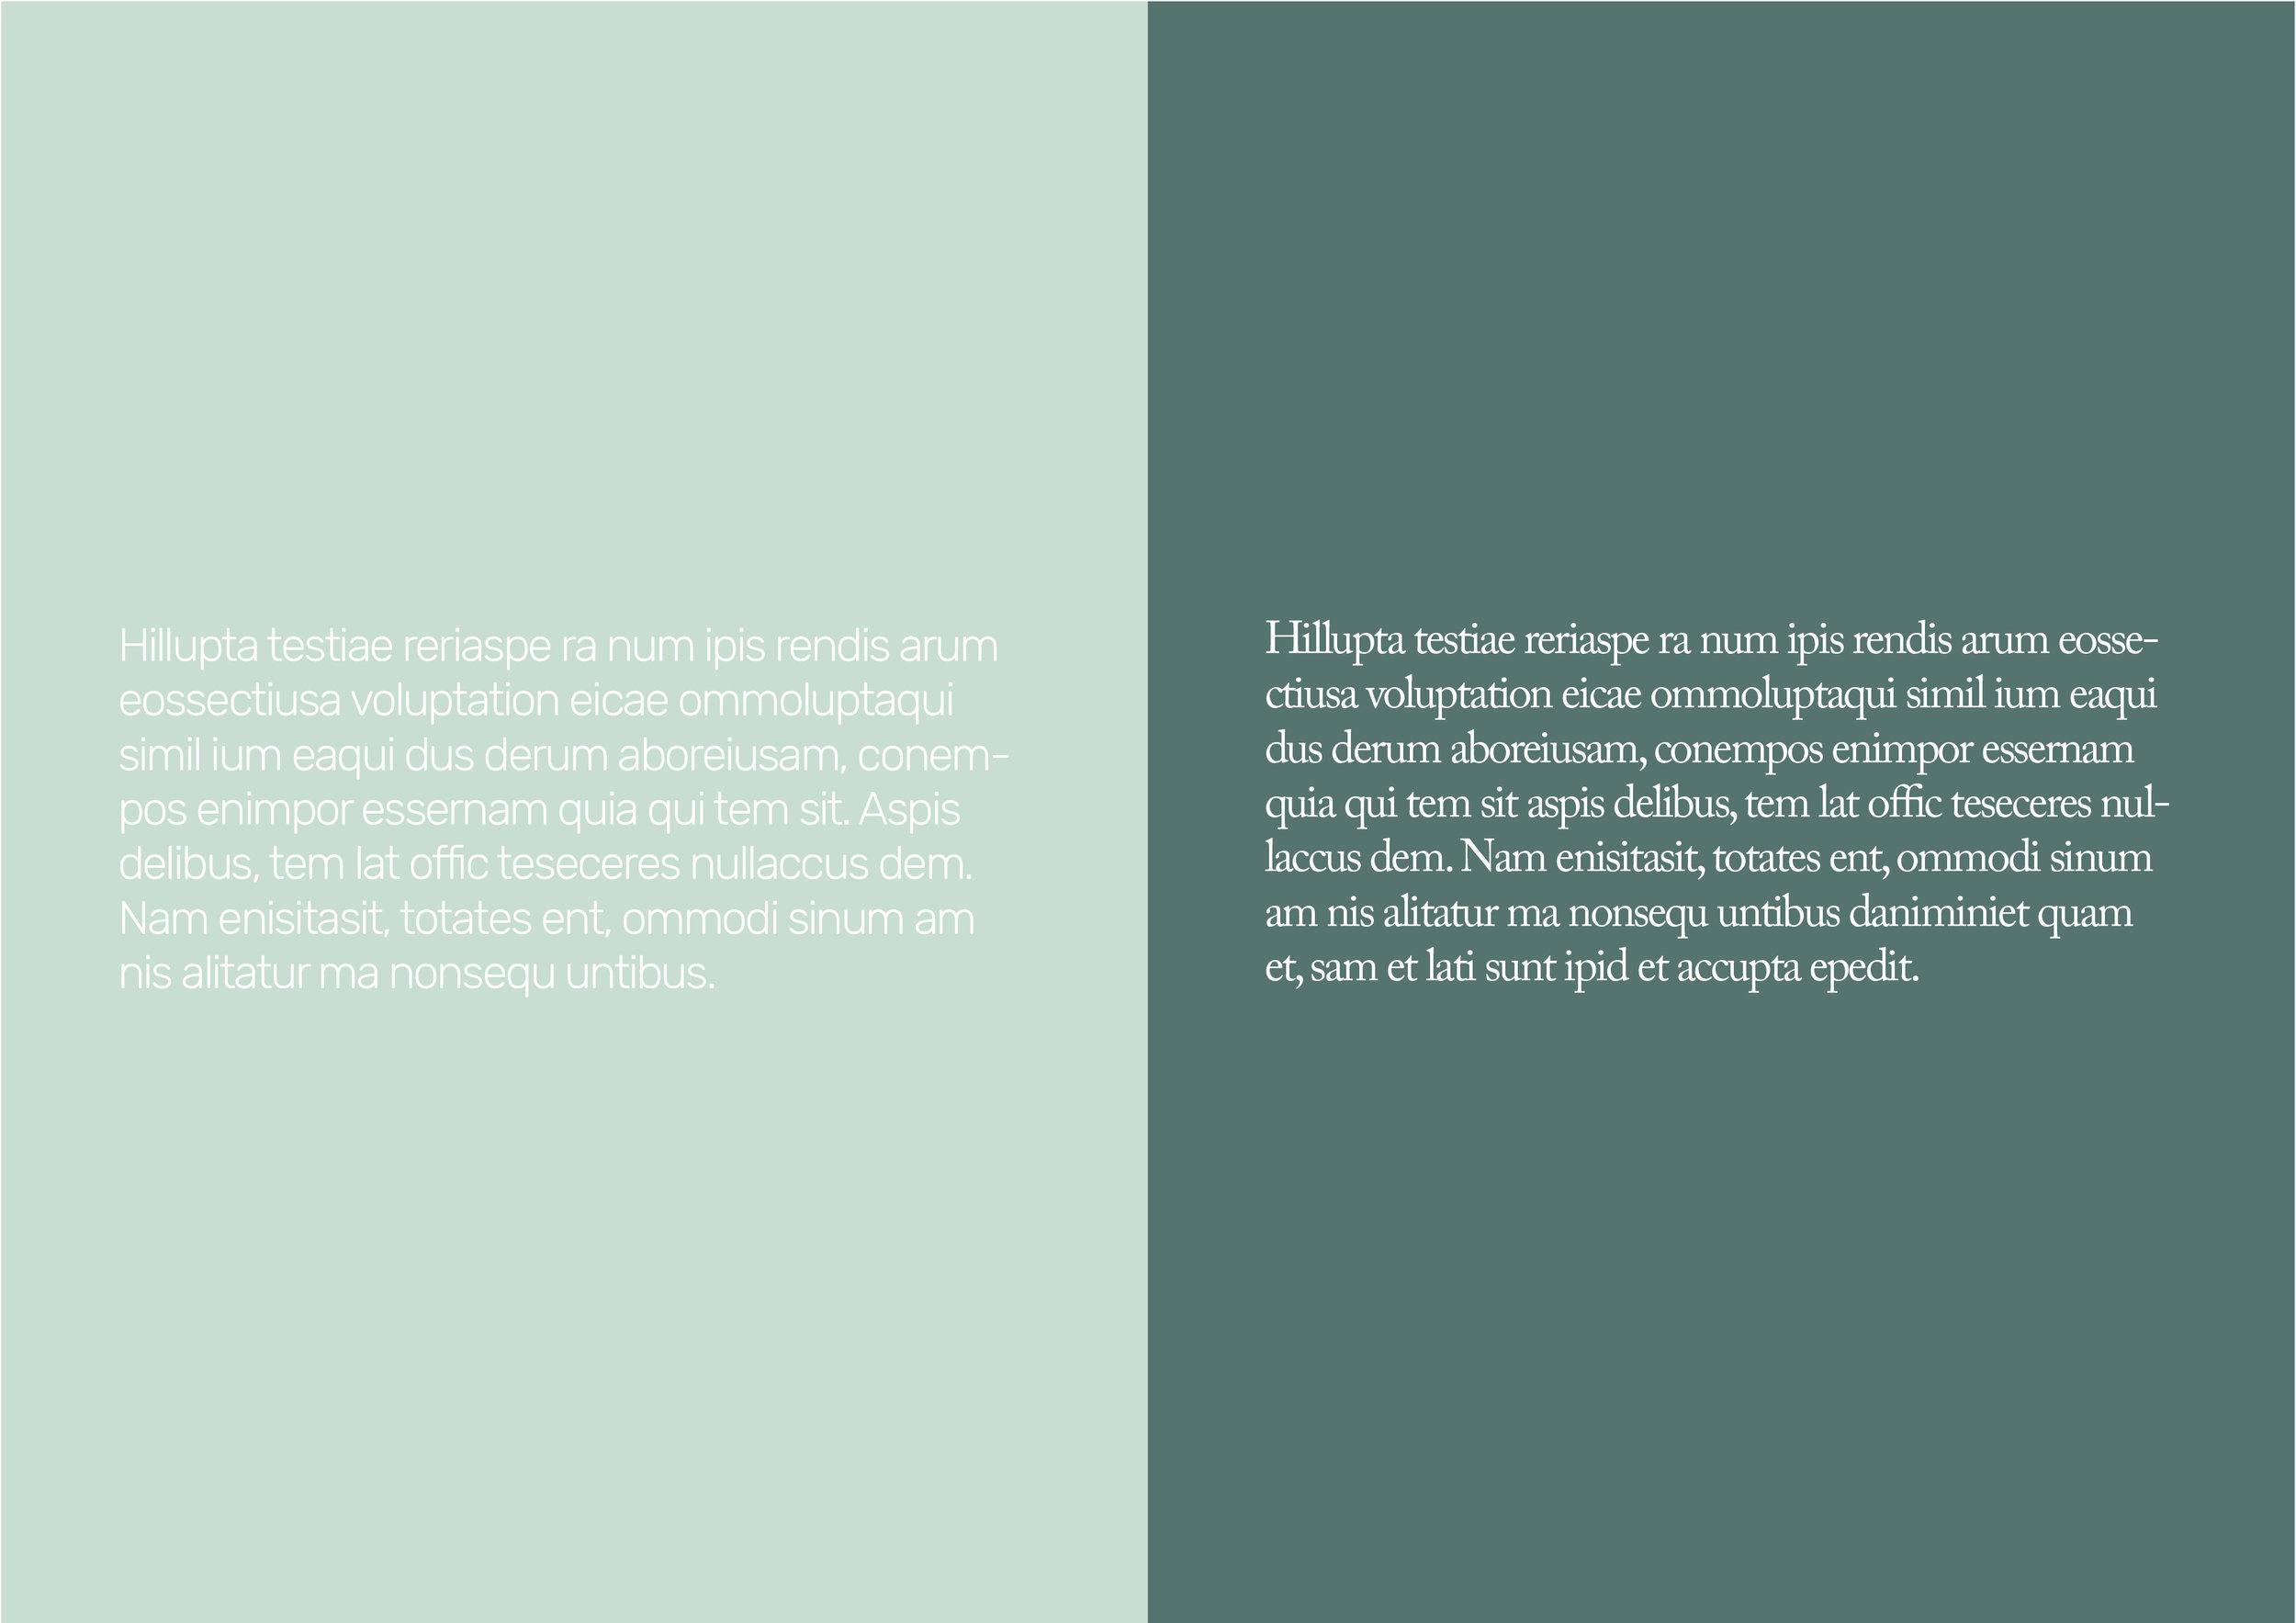 Typography ingress/ body —  Rubik/ Adobe Caslon Pro